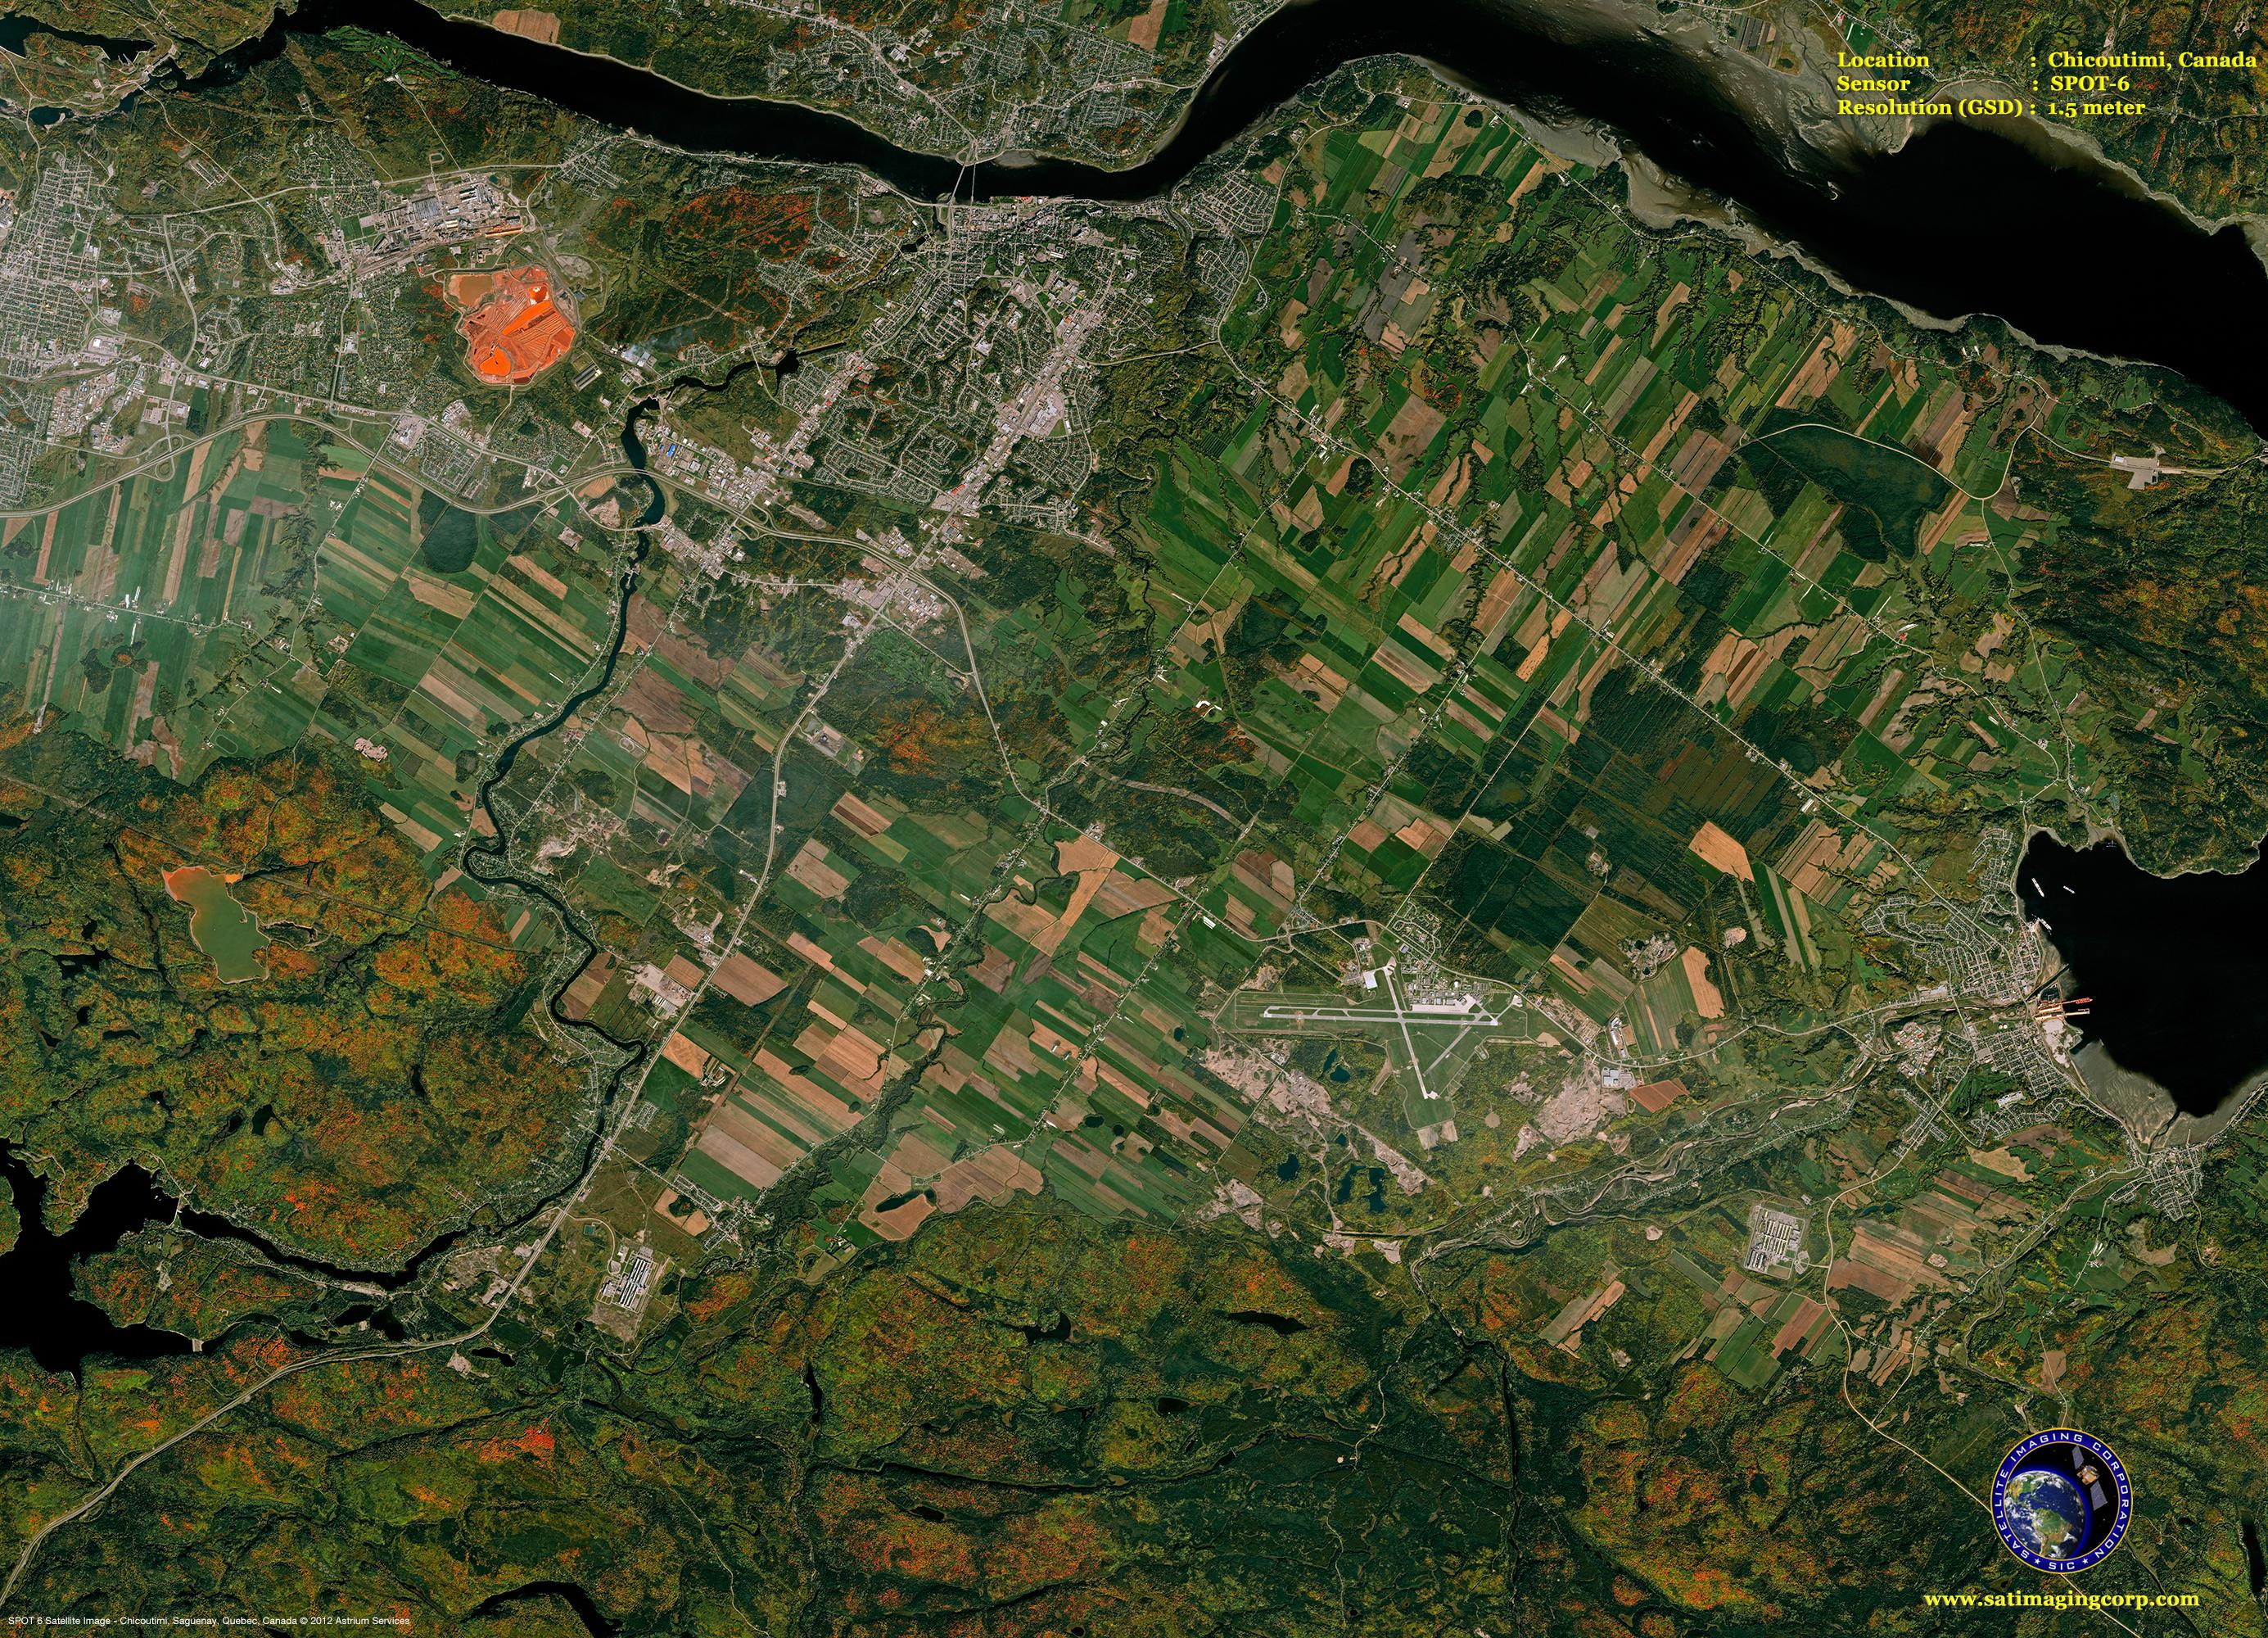 SPOT-6 Satellite Image of Chicoutimi, Canada   Satellite ...